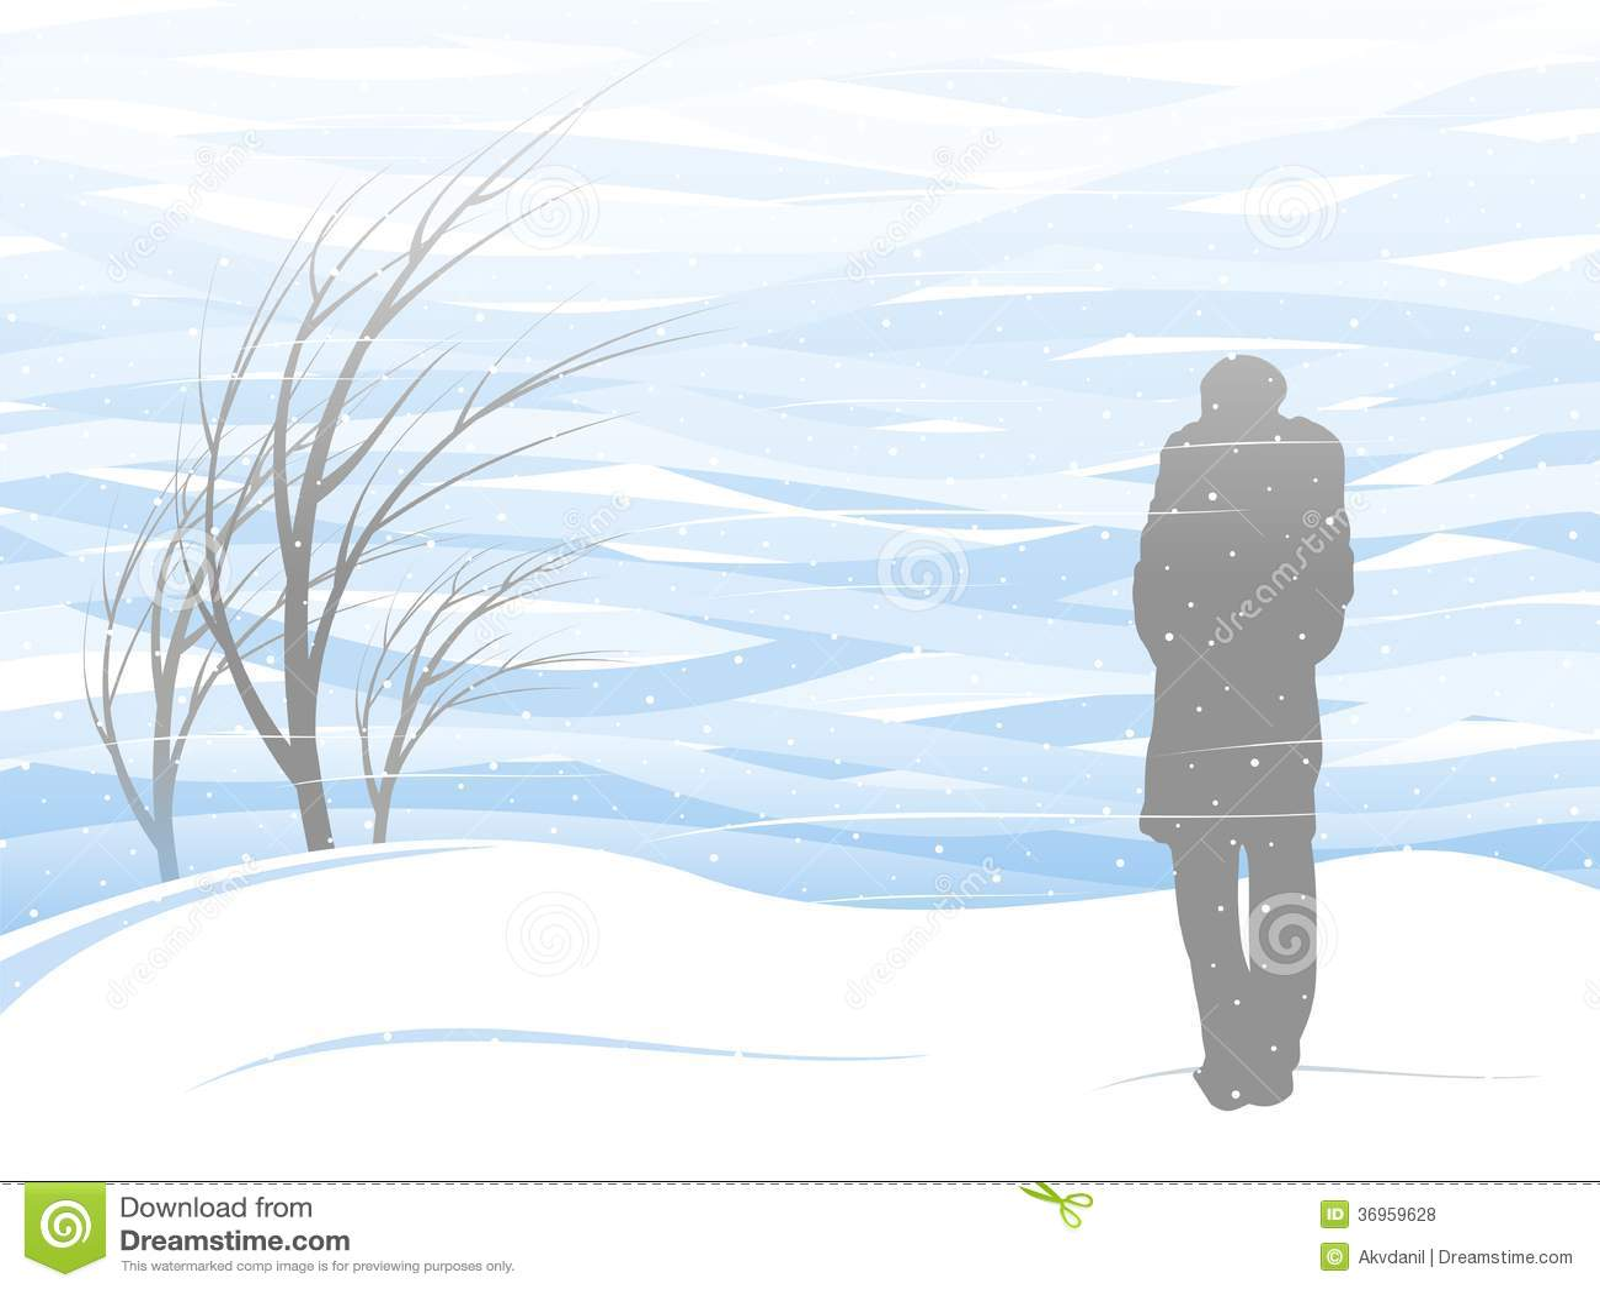 White snowstorm